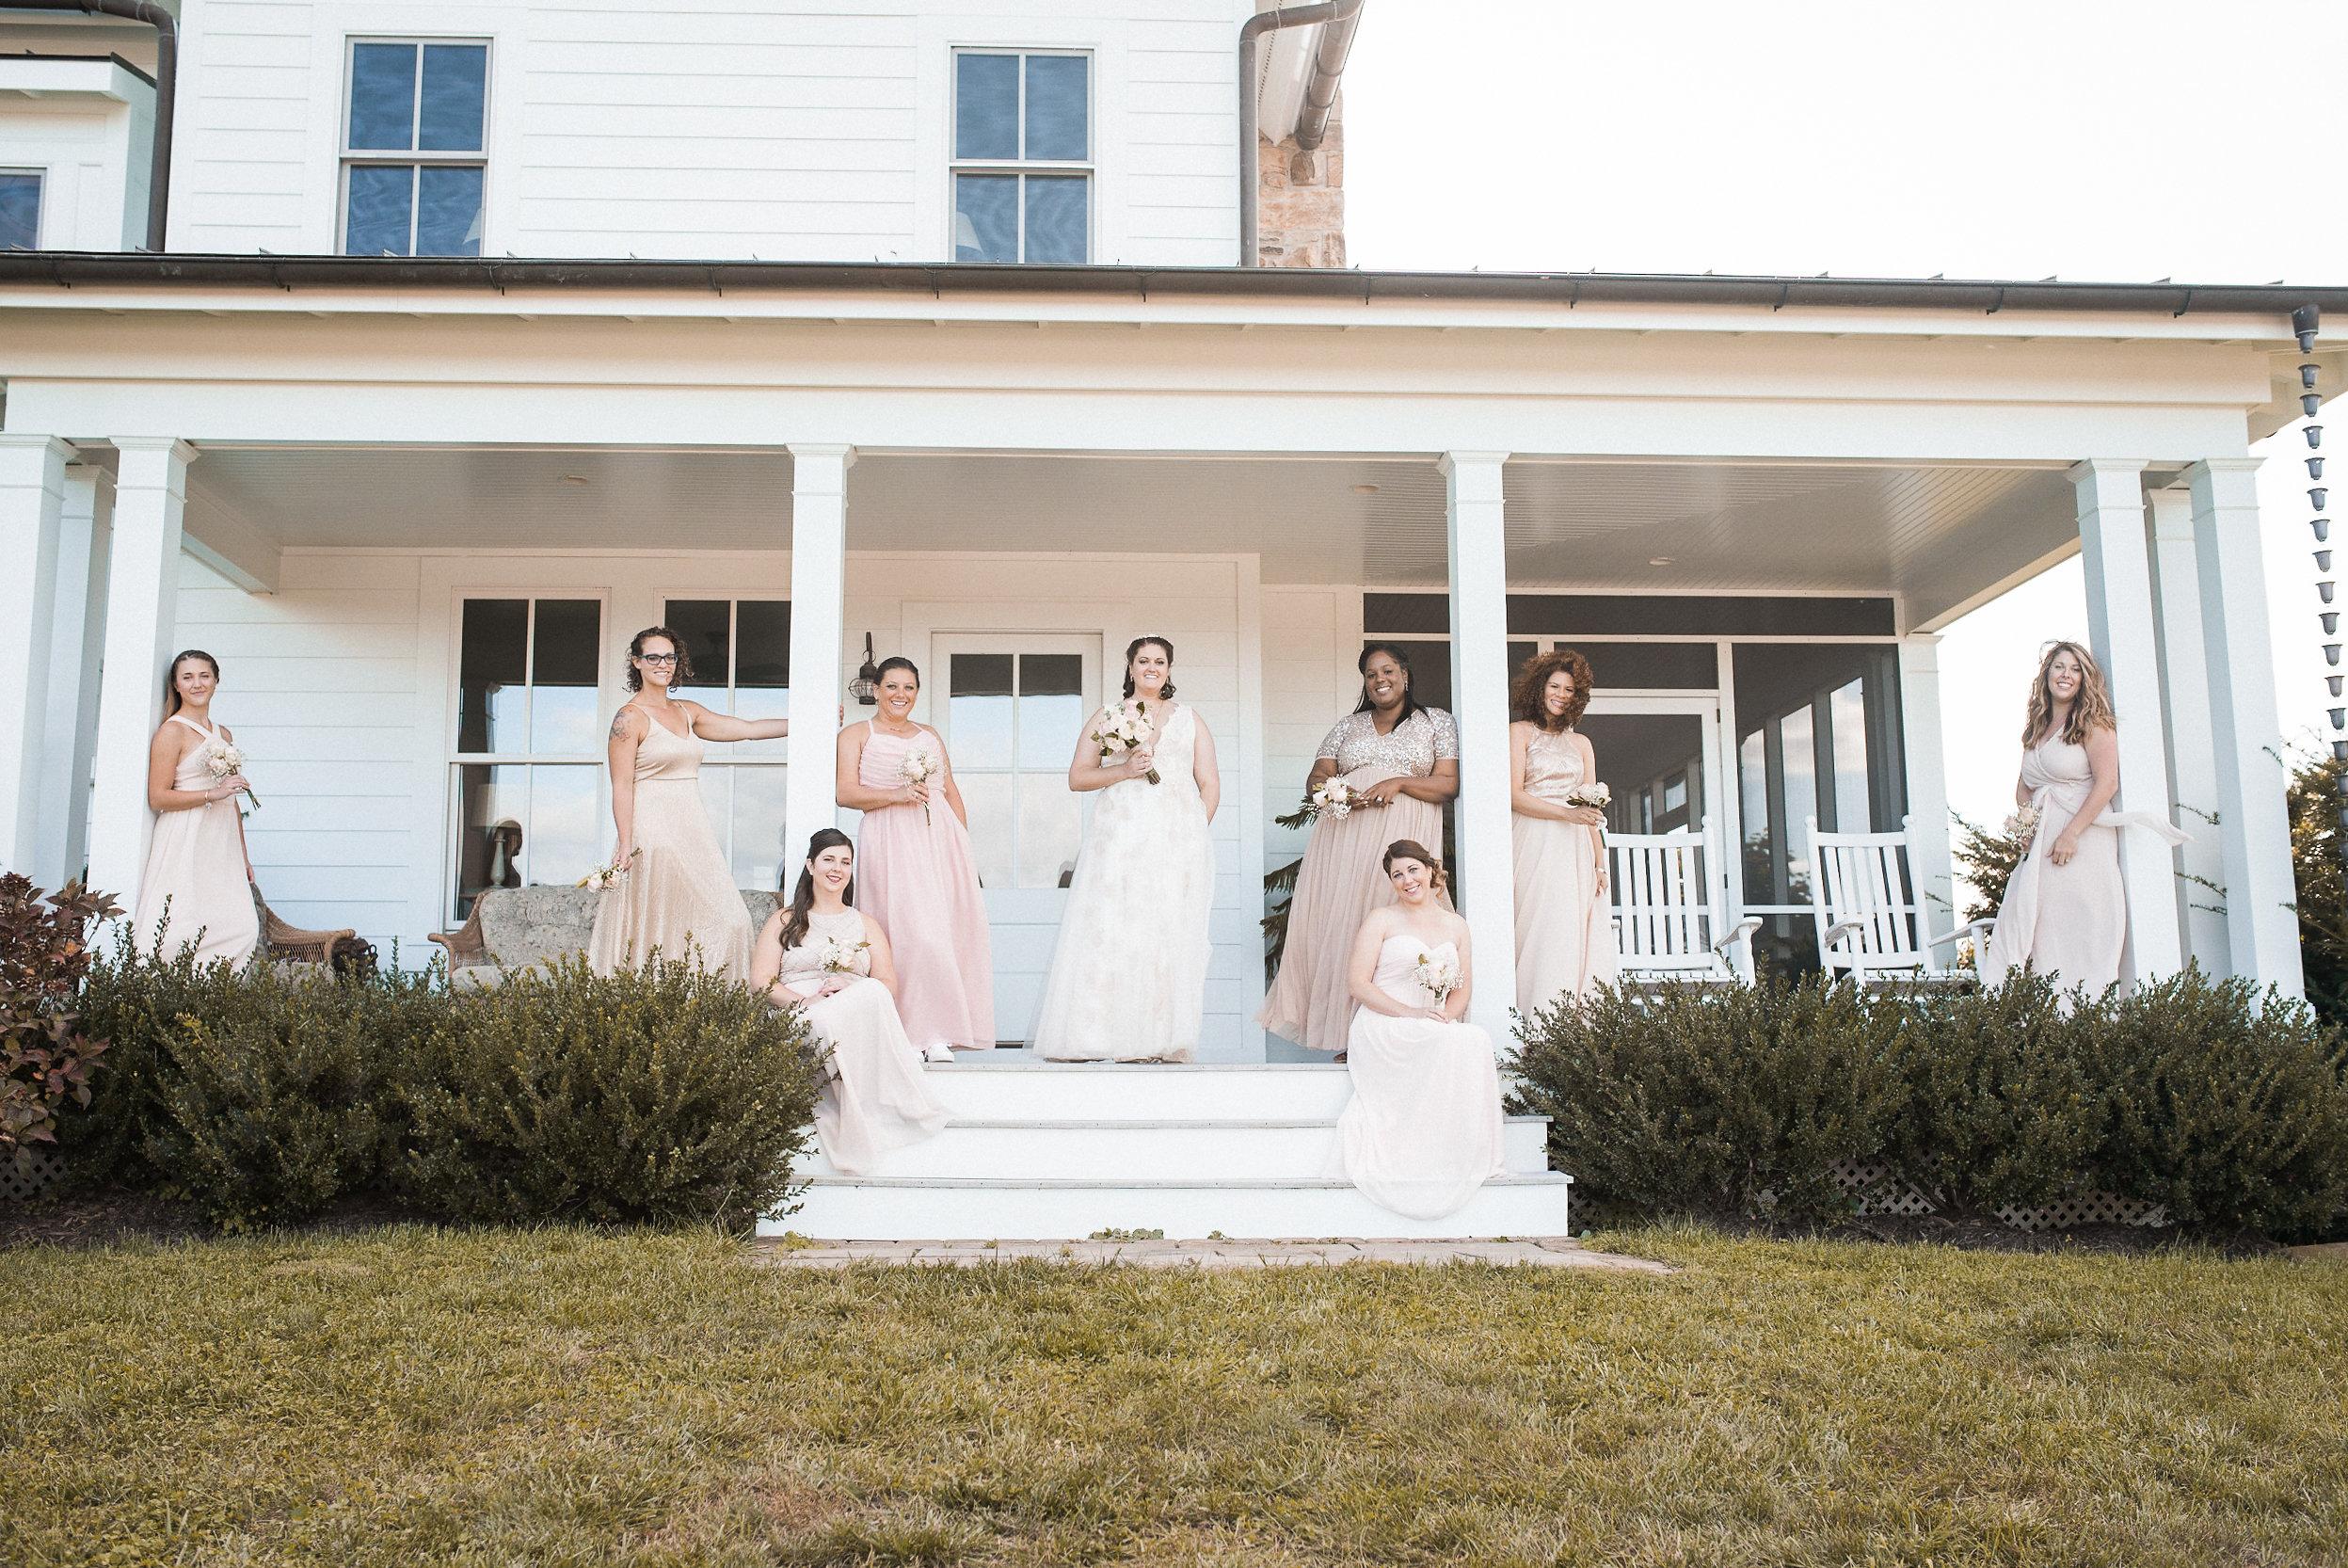 Bridal party posing on porch